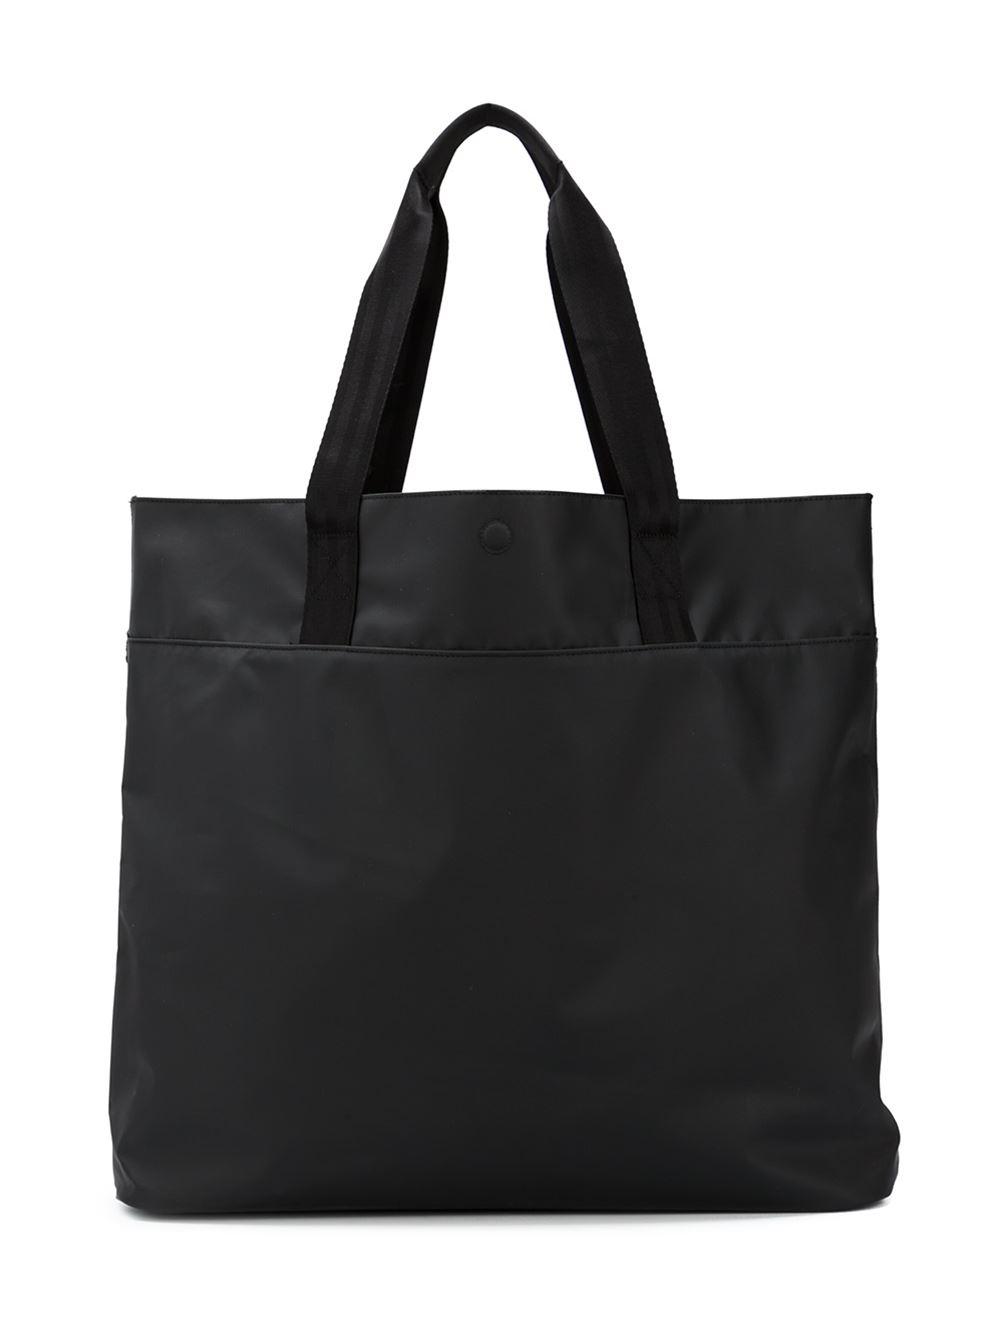 Herschel Supply Co. 'folio Tarpuline' Tote Bag in Black